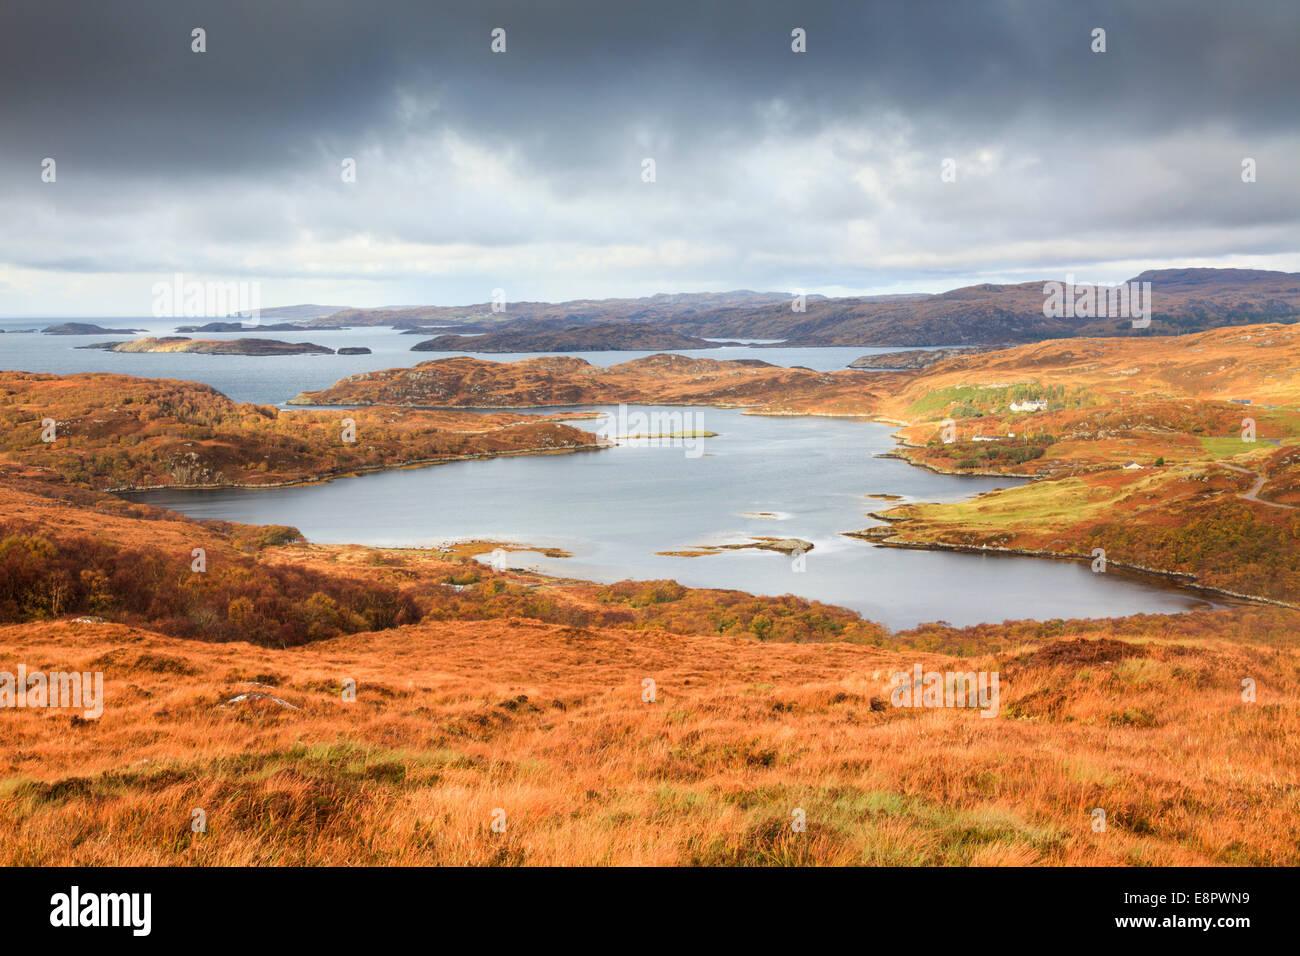 Loch Ardbhair near Drumbeg in Assynt, Scotland - Stock Image